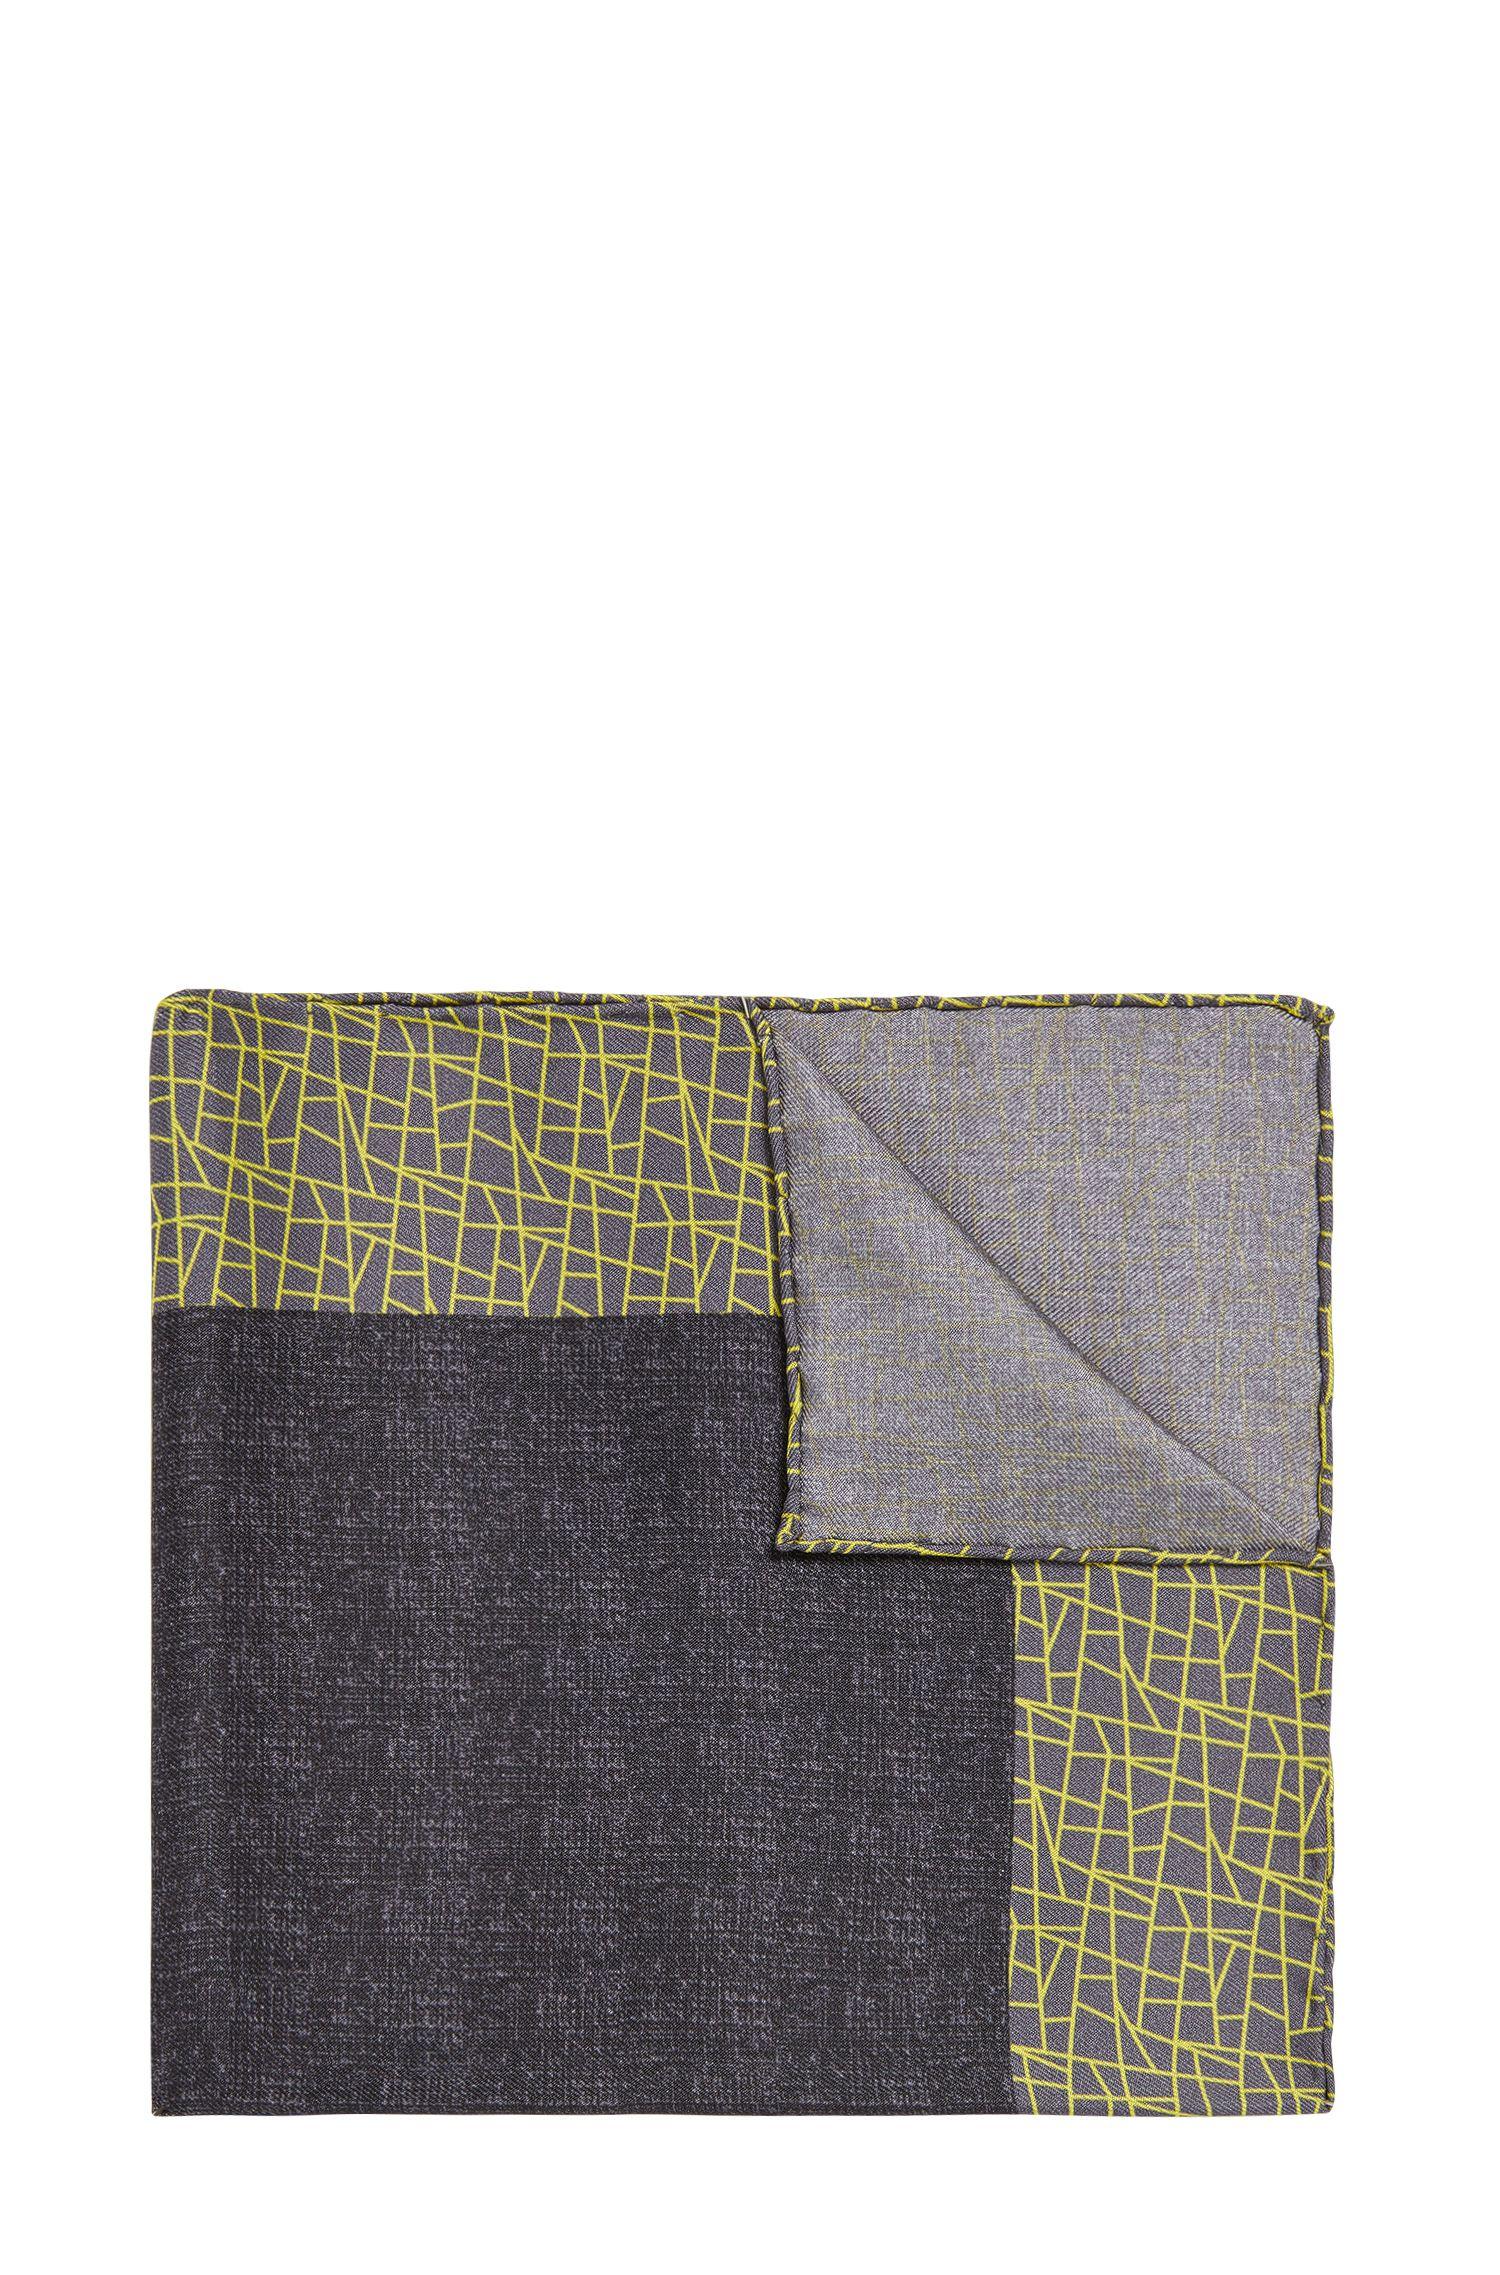 Pañuelo de bolsillo de la línea Tailored en seda en mezcla de estampados: 'T-Pocket sq. 33x33 cm'